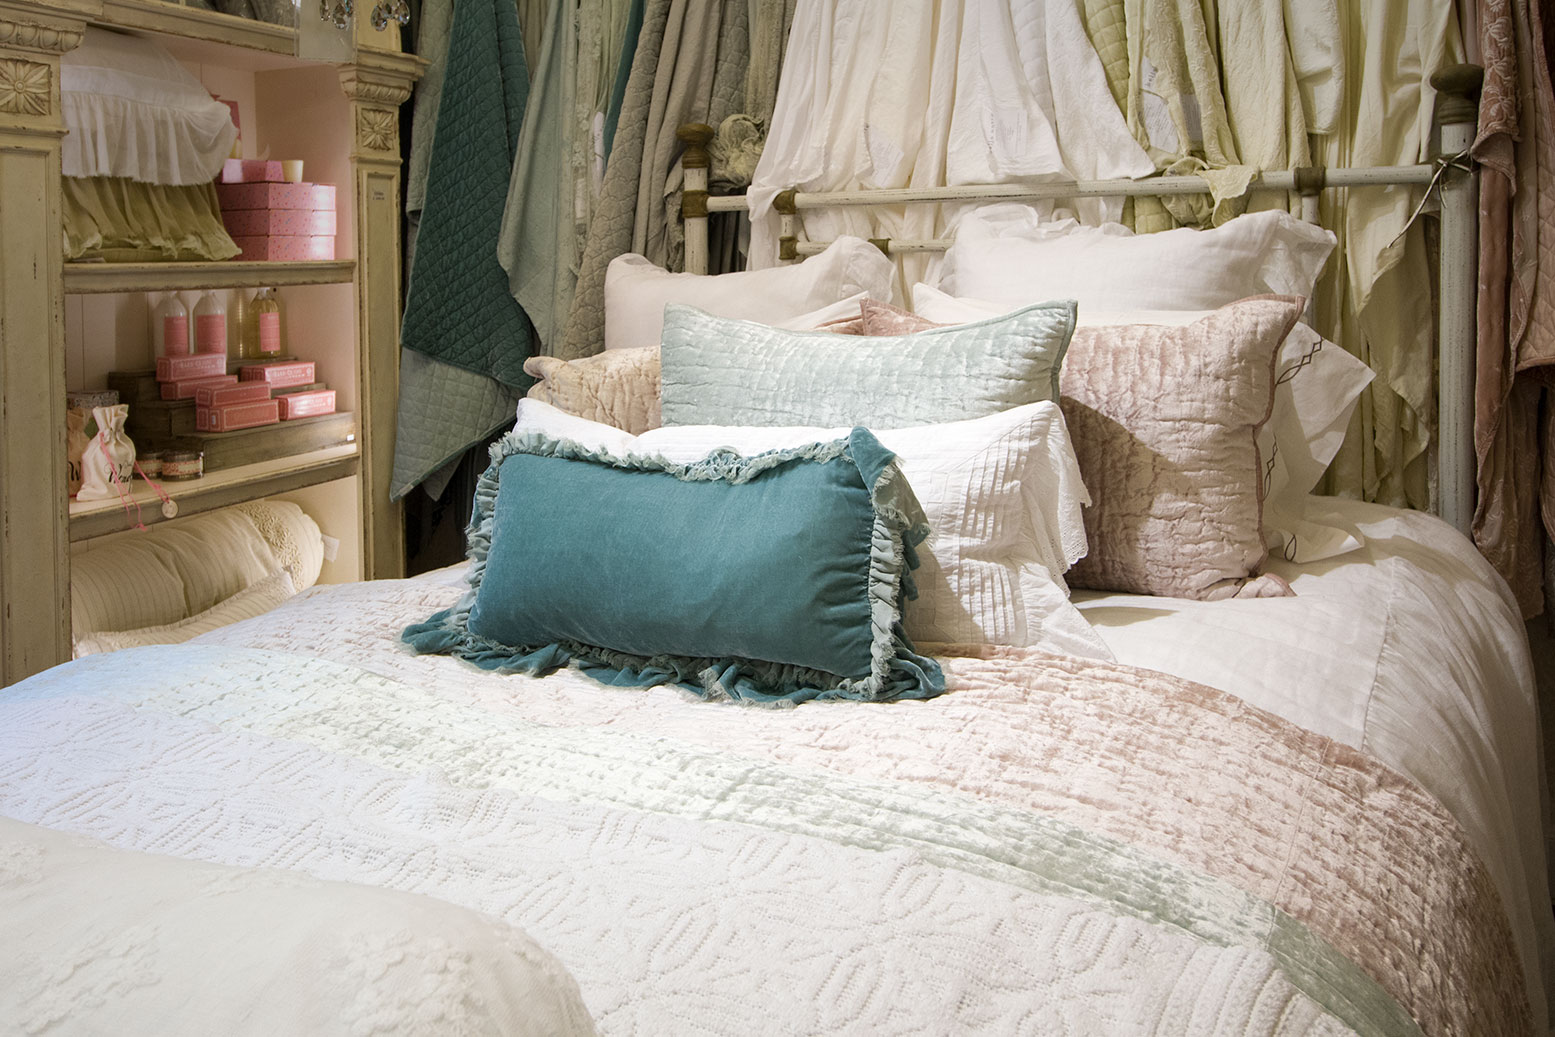 Bedding-Sale7pch